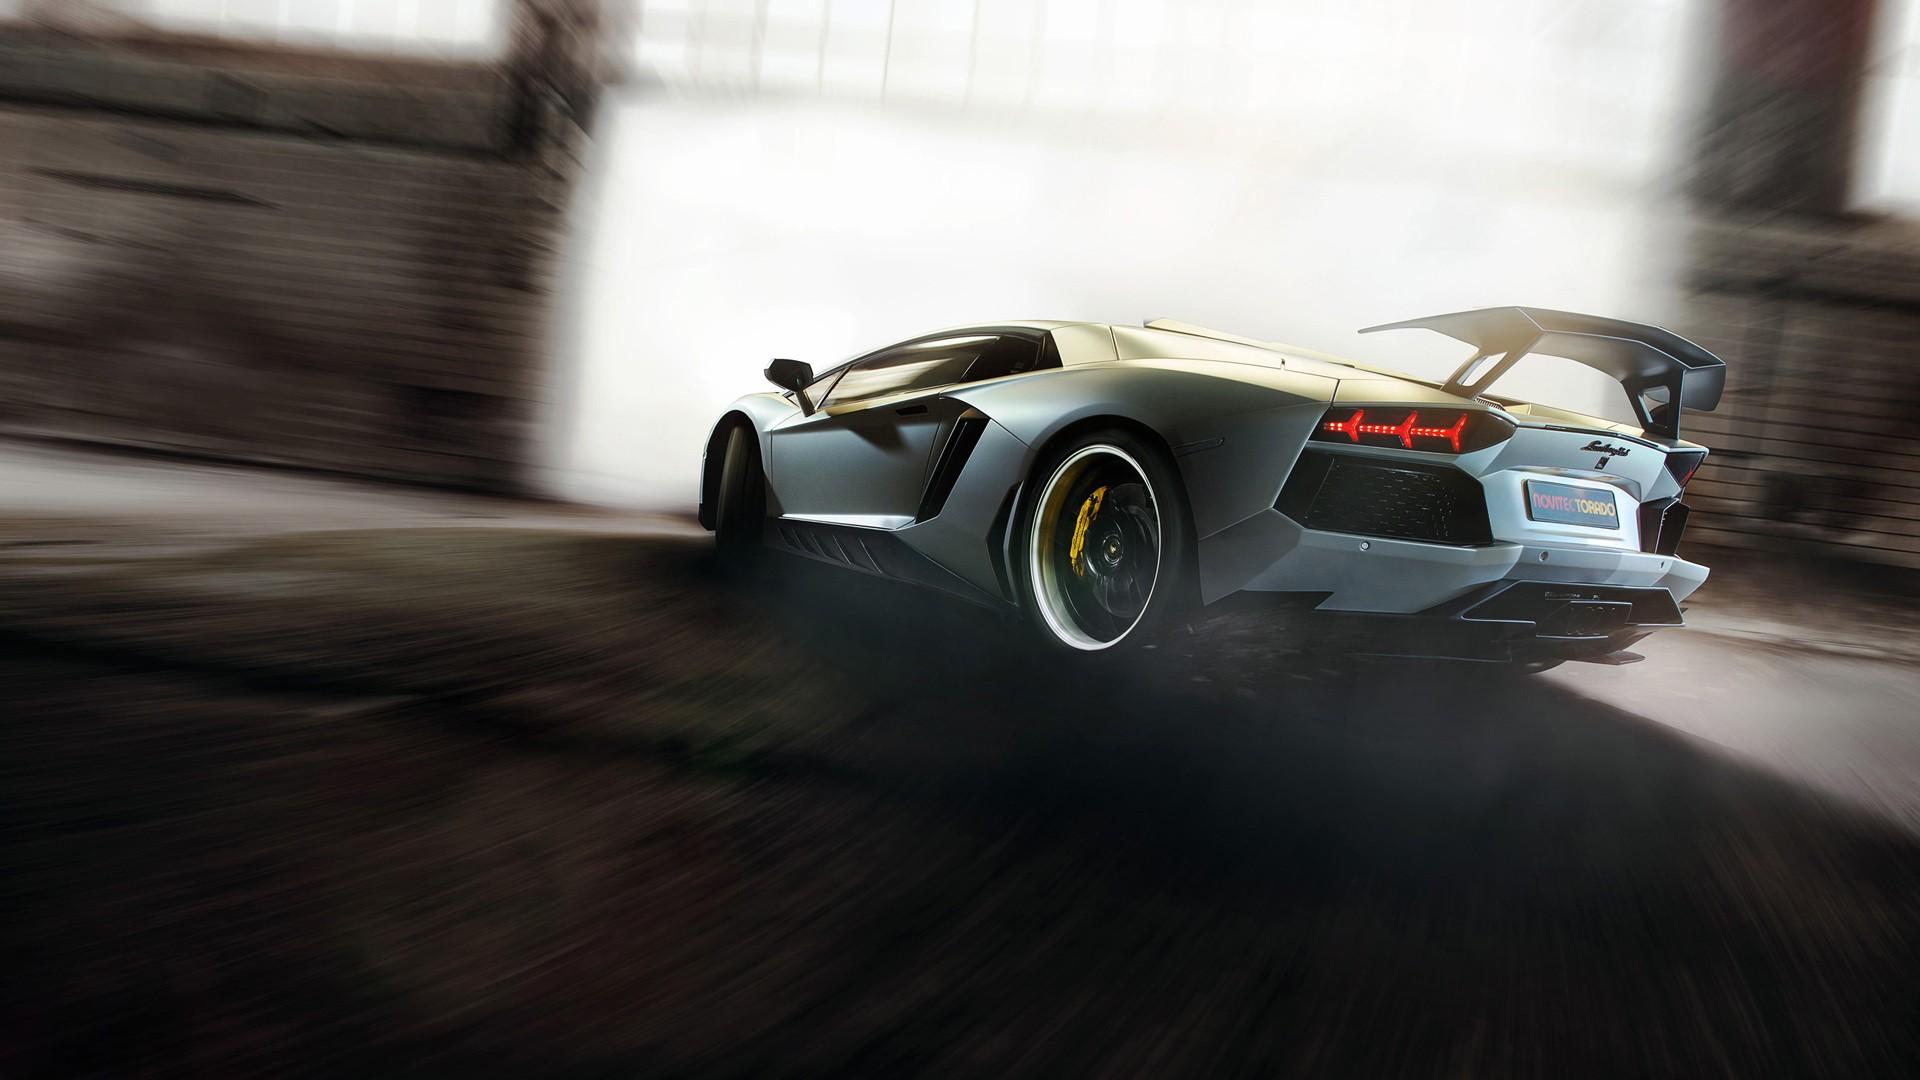 x 1080 original wallpaper 2013 novitec torado lamborghini aventador 3 - Tron Lamborghini Aventador Wallpaper